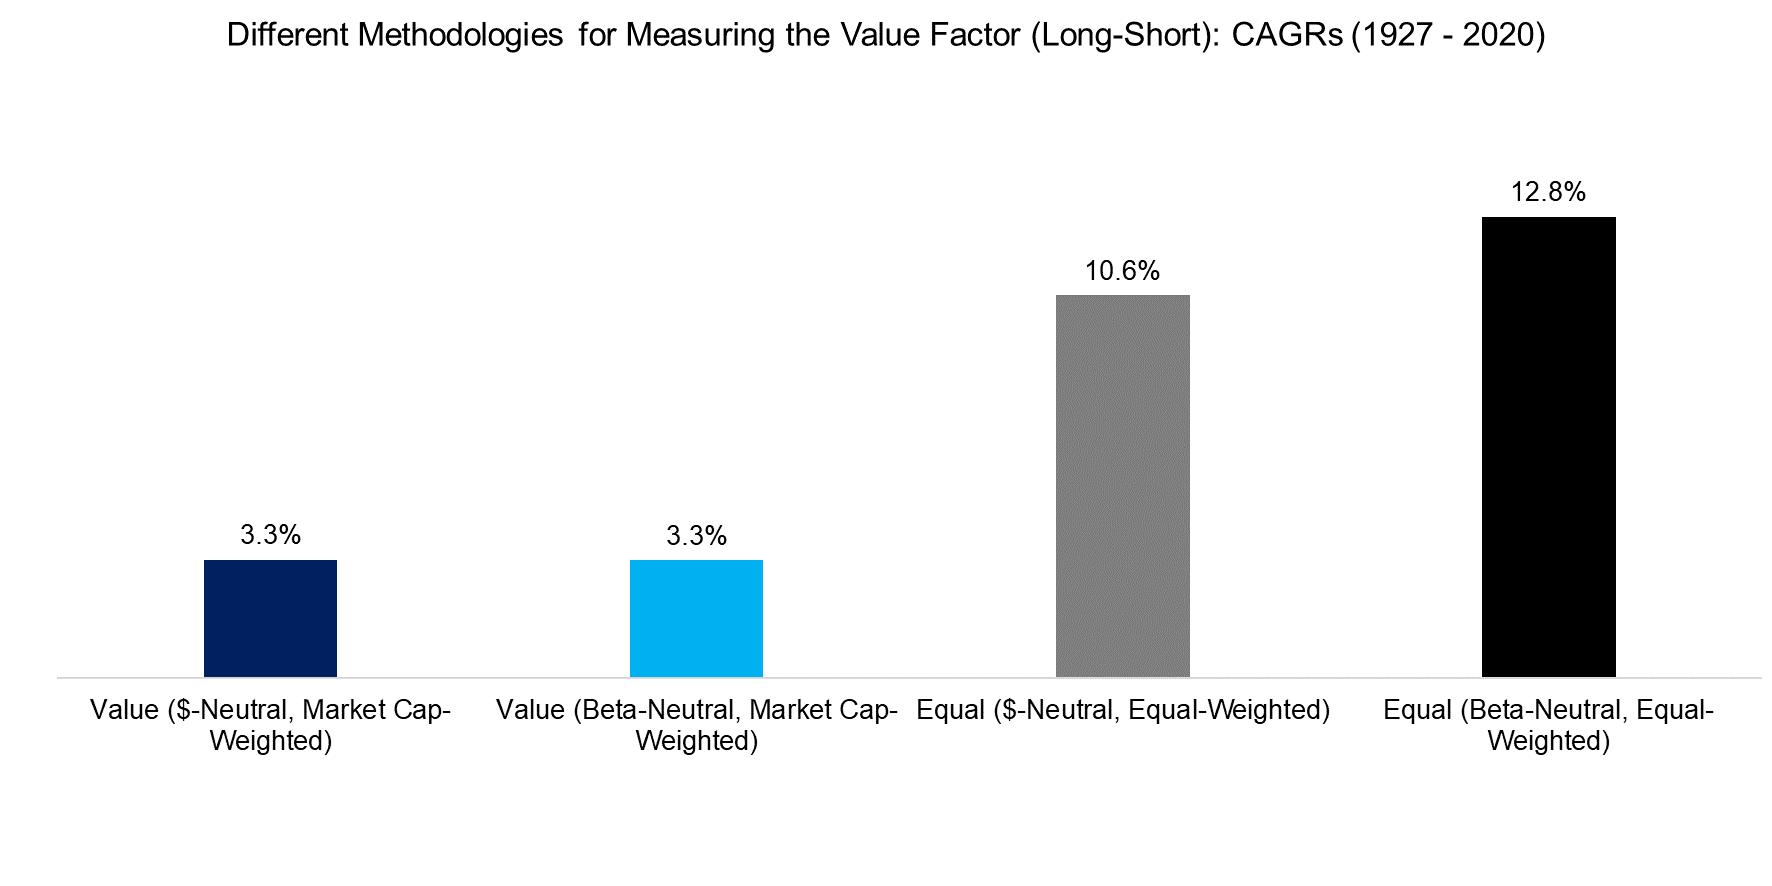 Different Methodologies for Measuring the Value Factor (Long-Short) CAGRs (1927 - 202